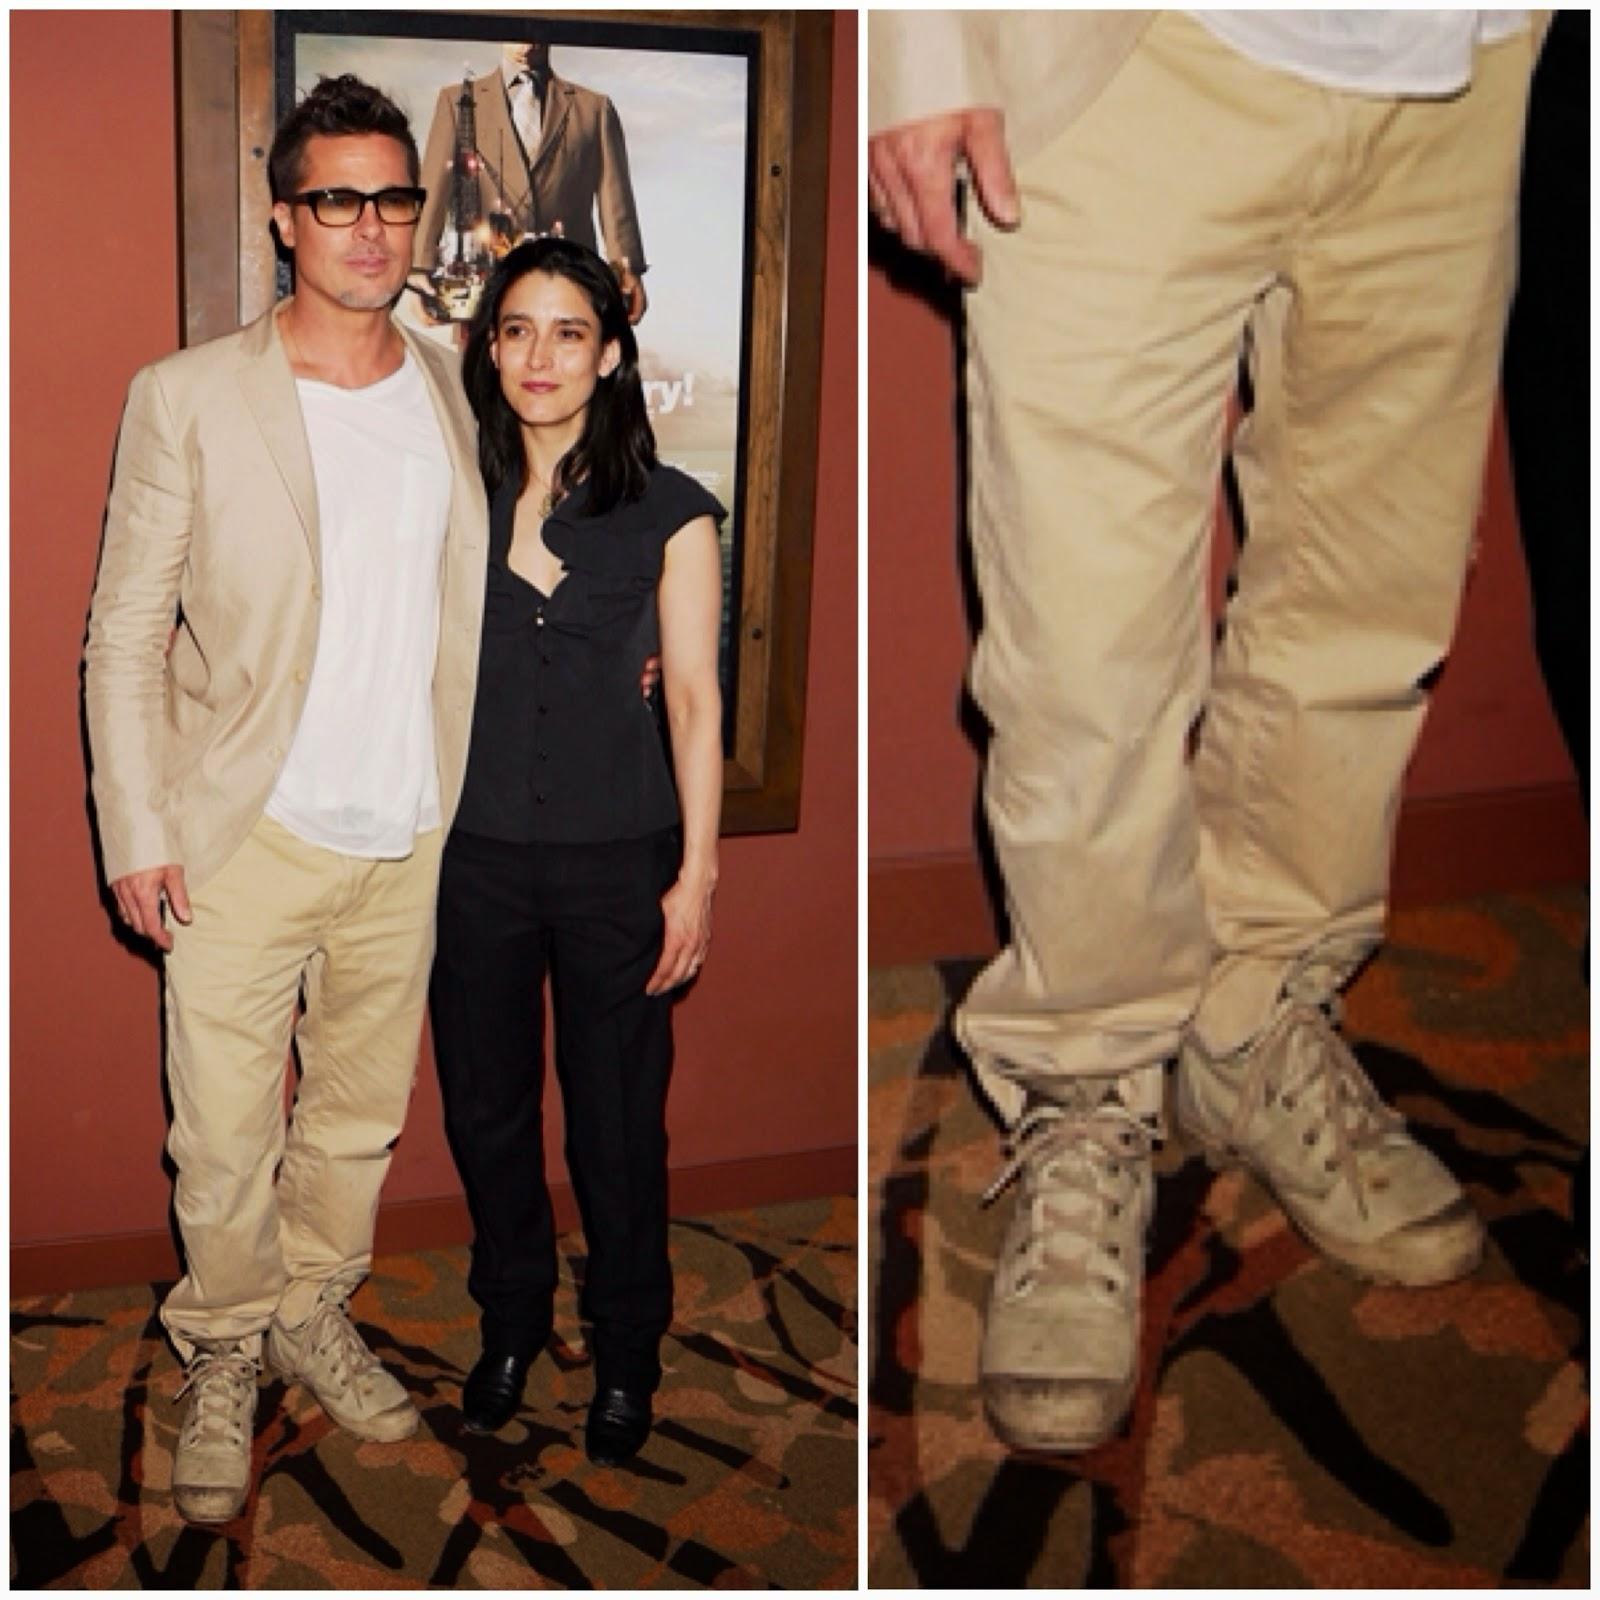 Brad Pitt's Palladium Boots - 'Big Men' Screening, Los Angeles